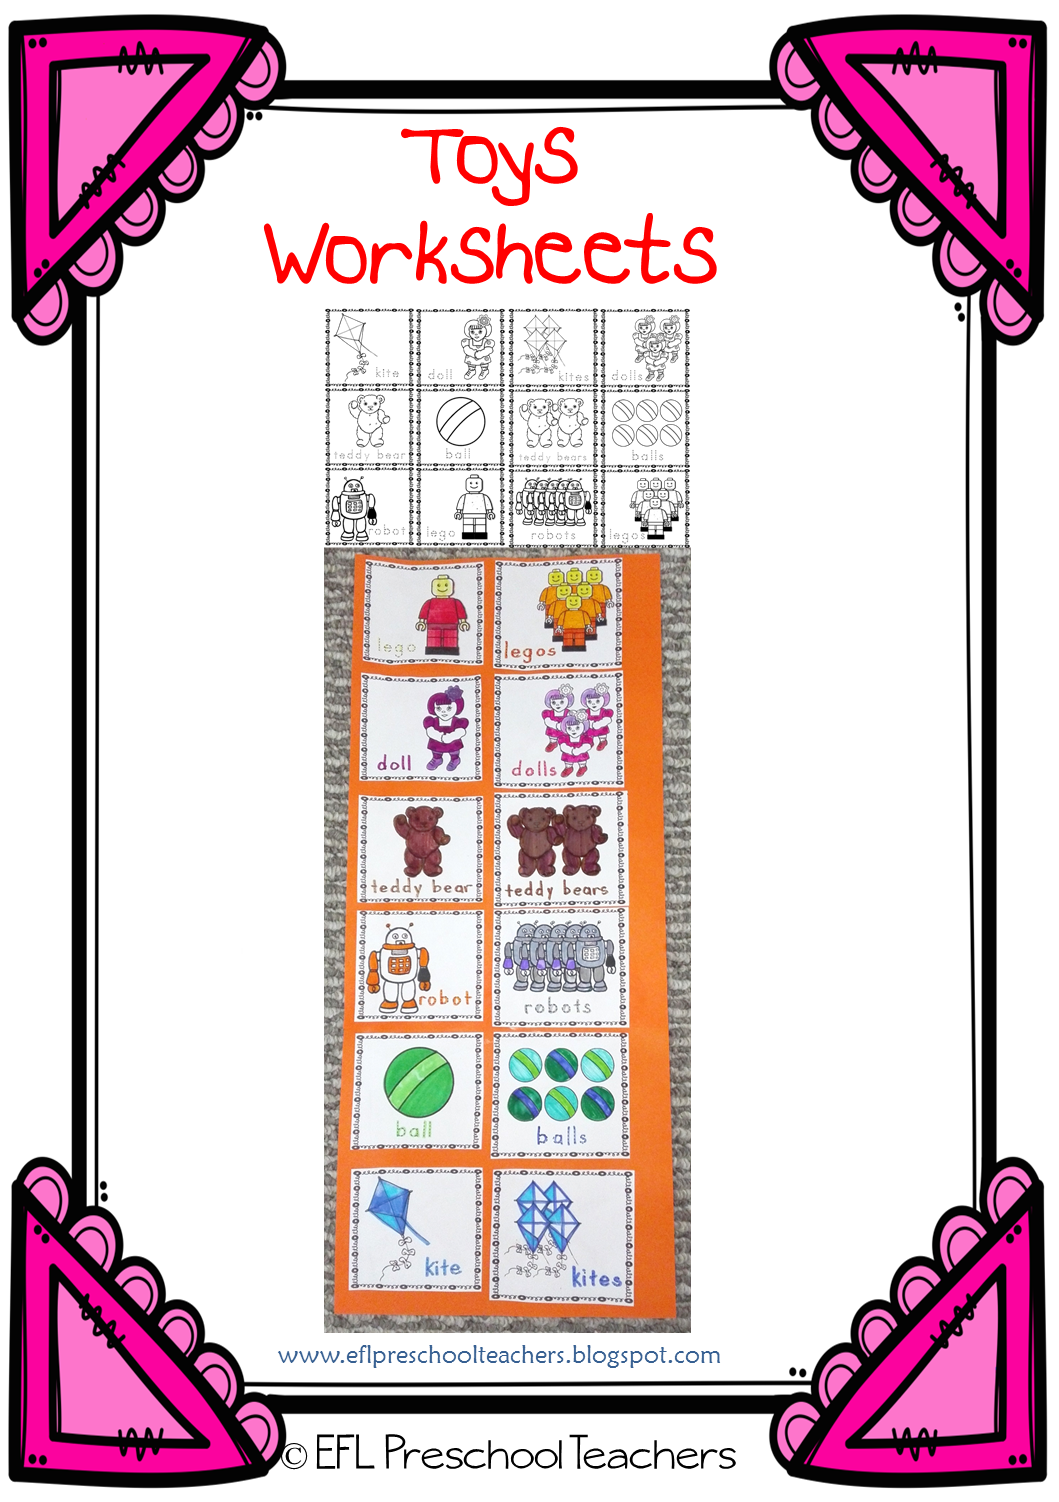 Esl Efl Preschool Teachers Toys Thematic Unit For Ell